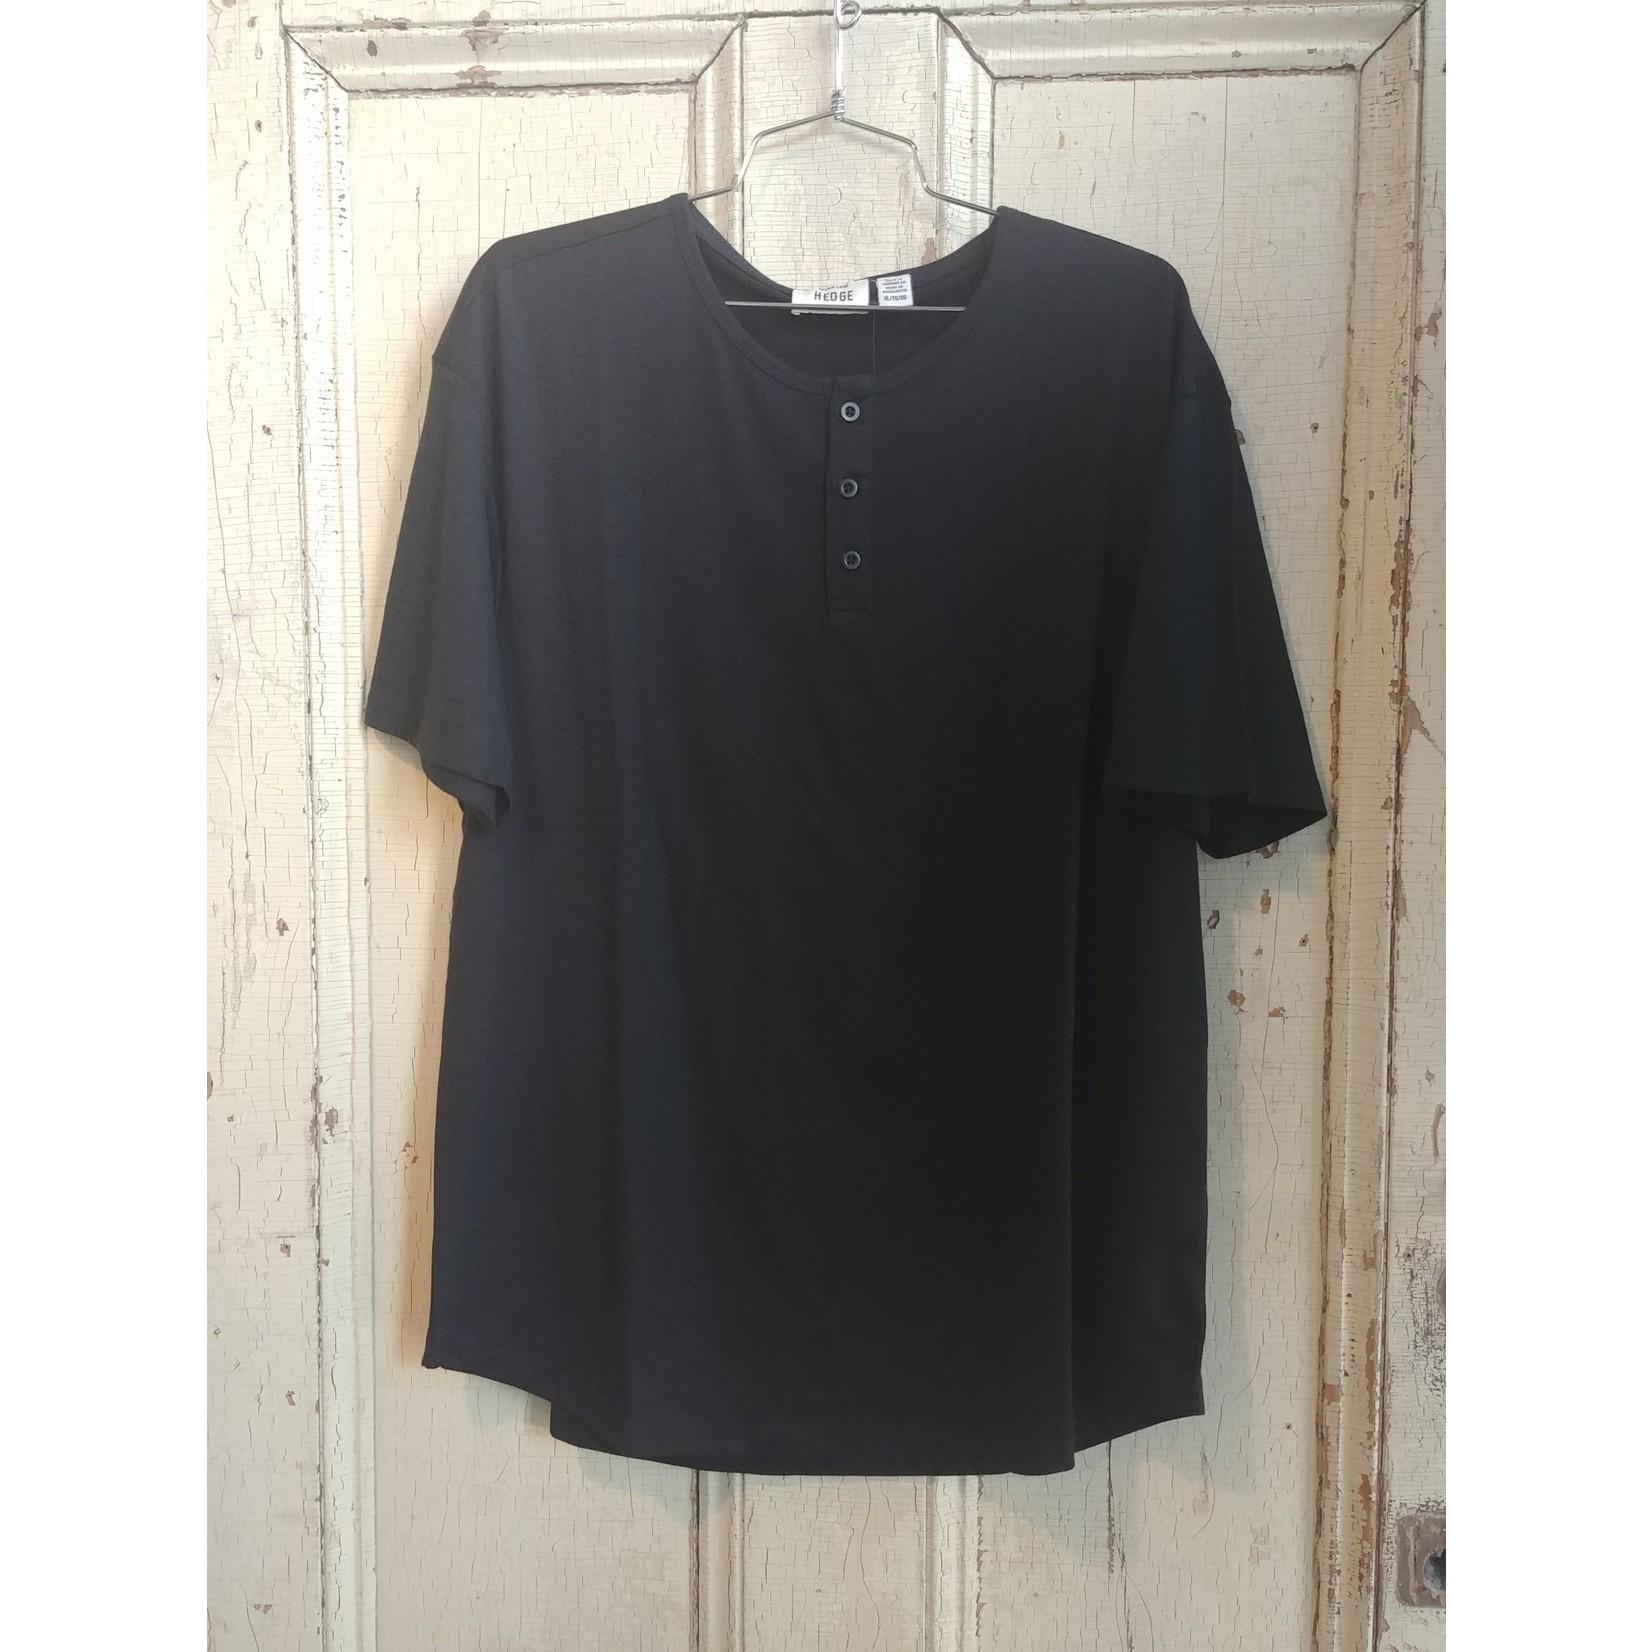 Hedge Men's Knit top black